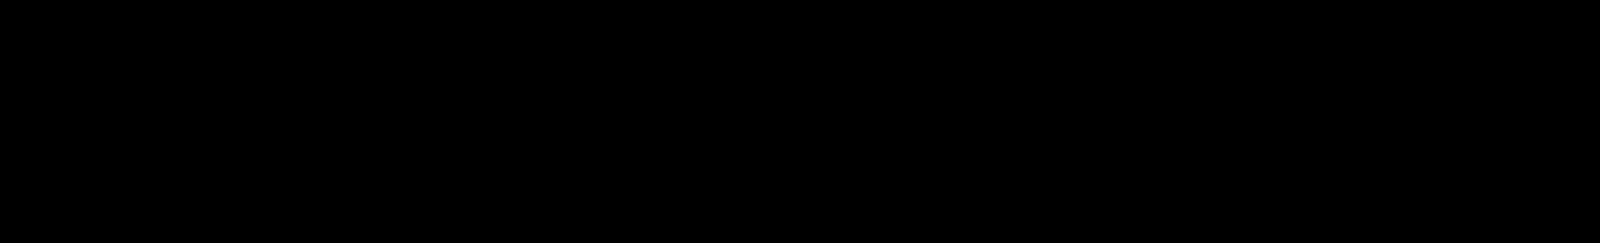 redox reaction exxample